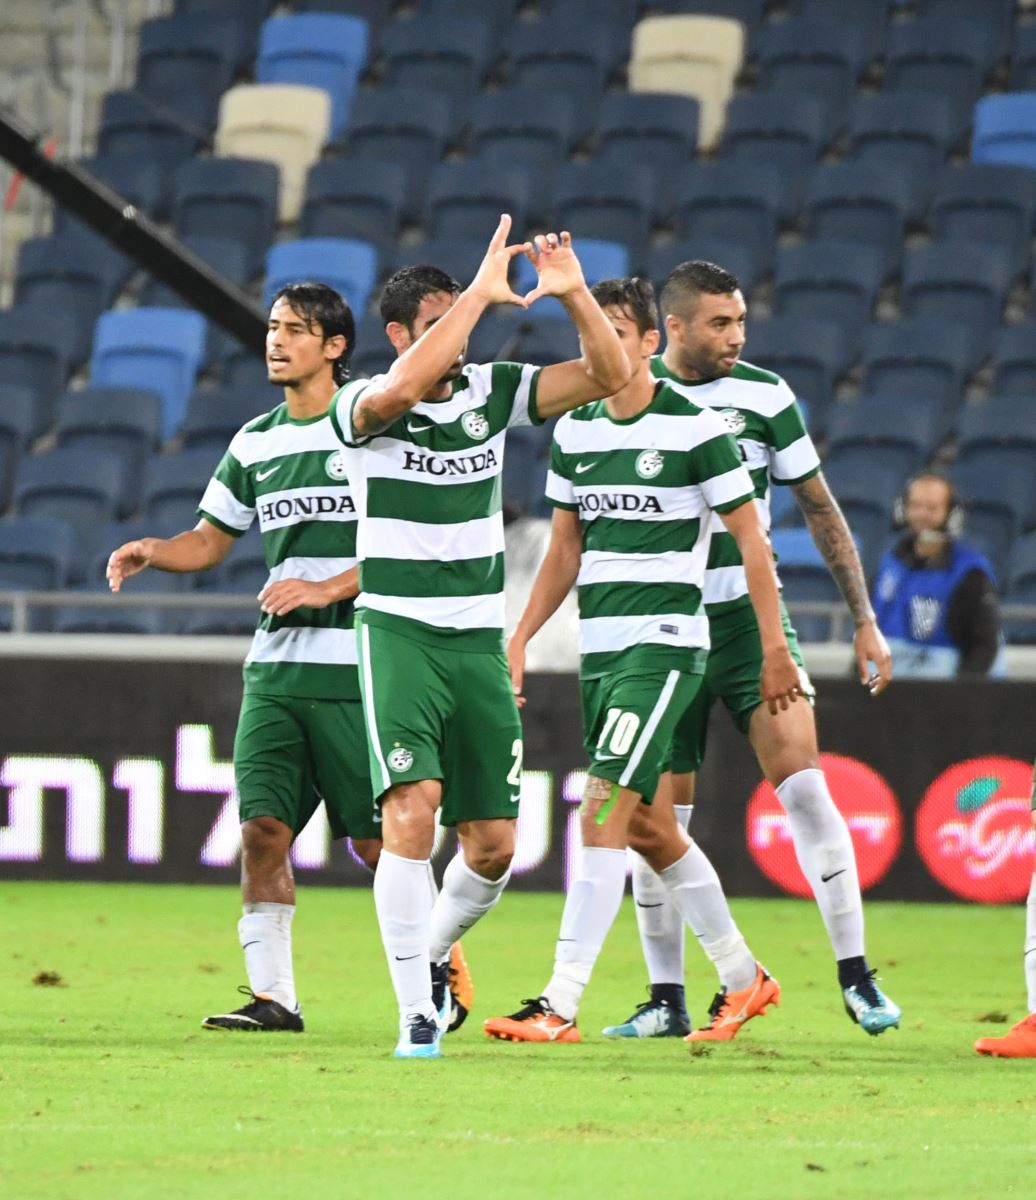 Maccabi Haifa beats Bnei Sakhnin 2:0